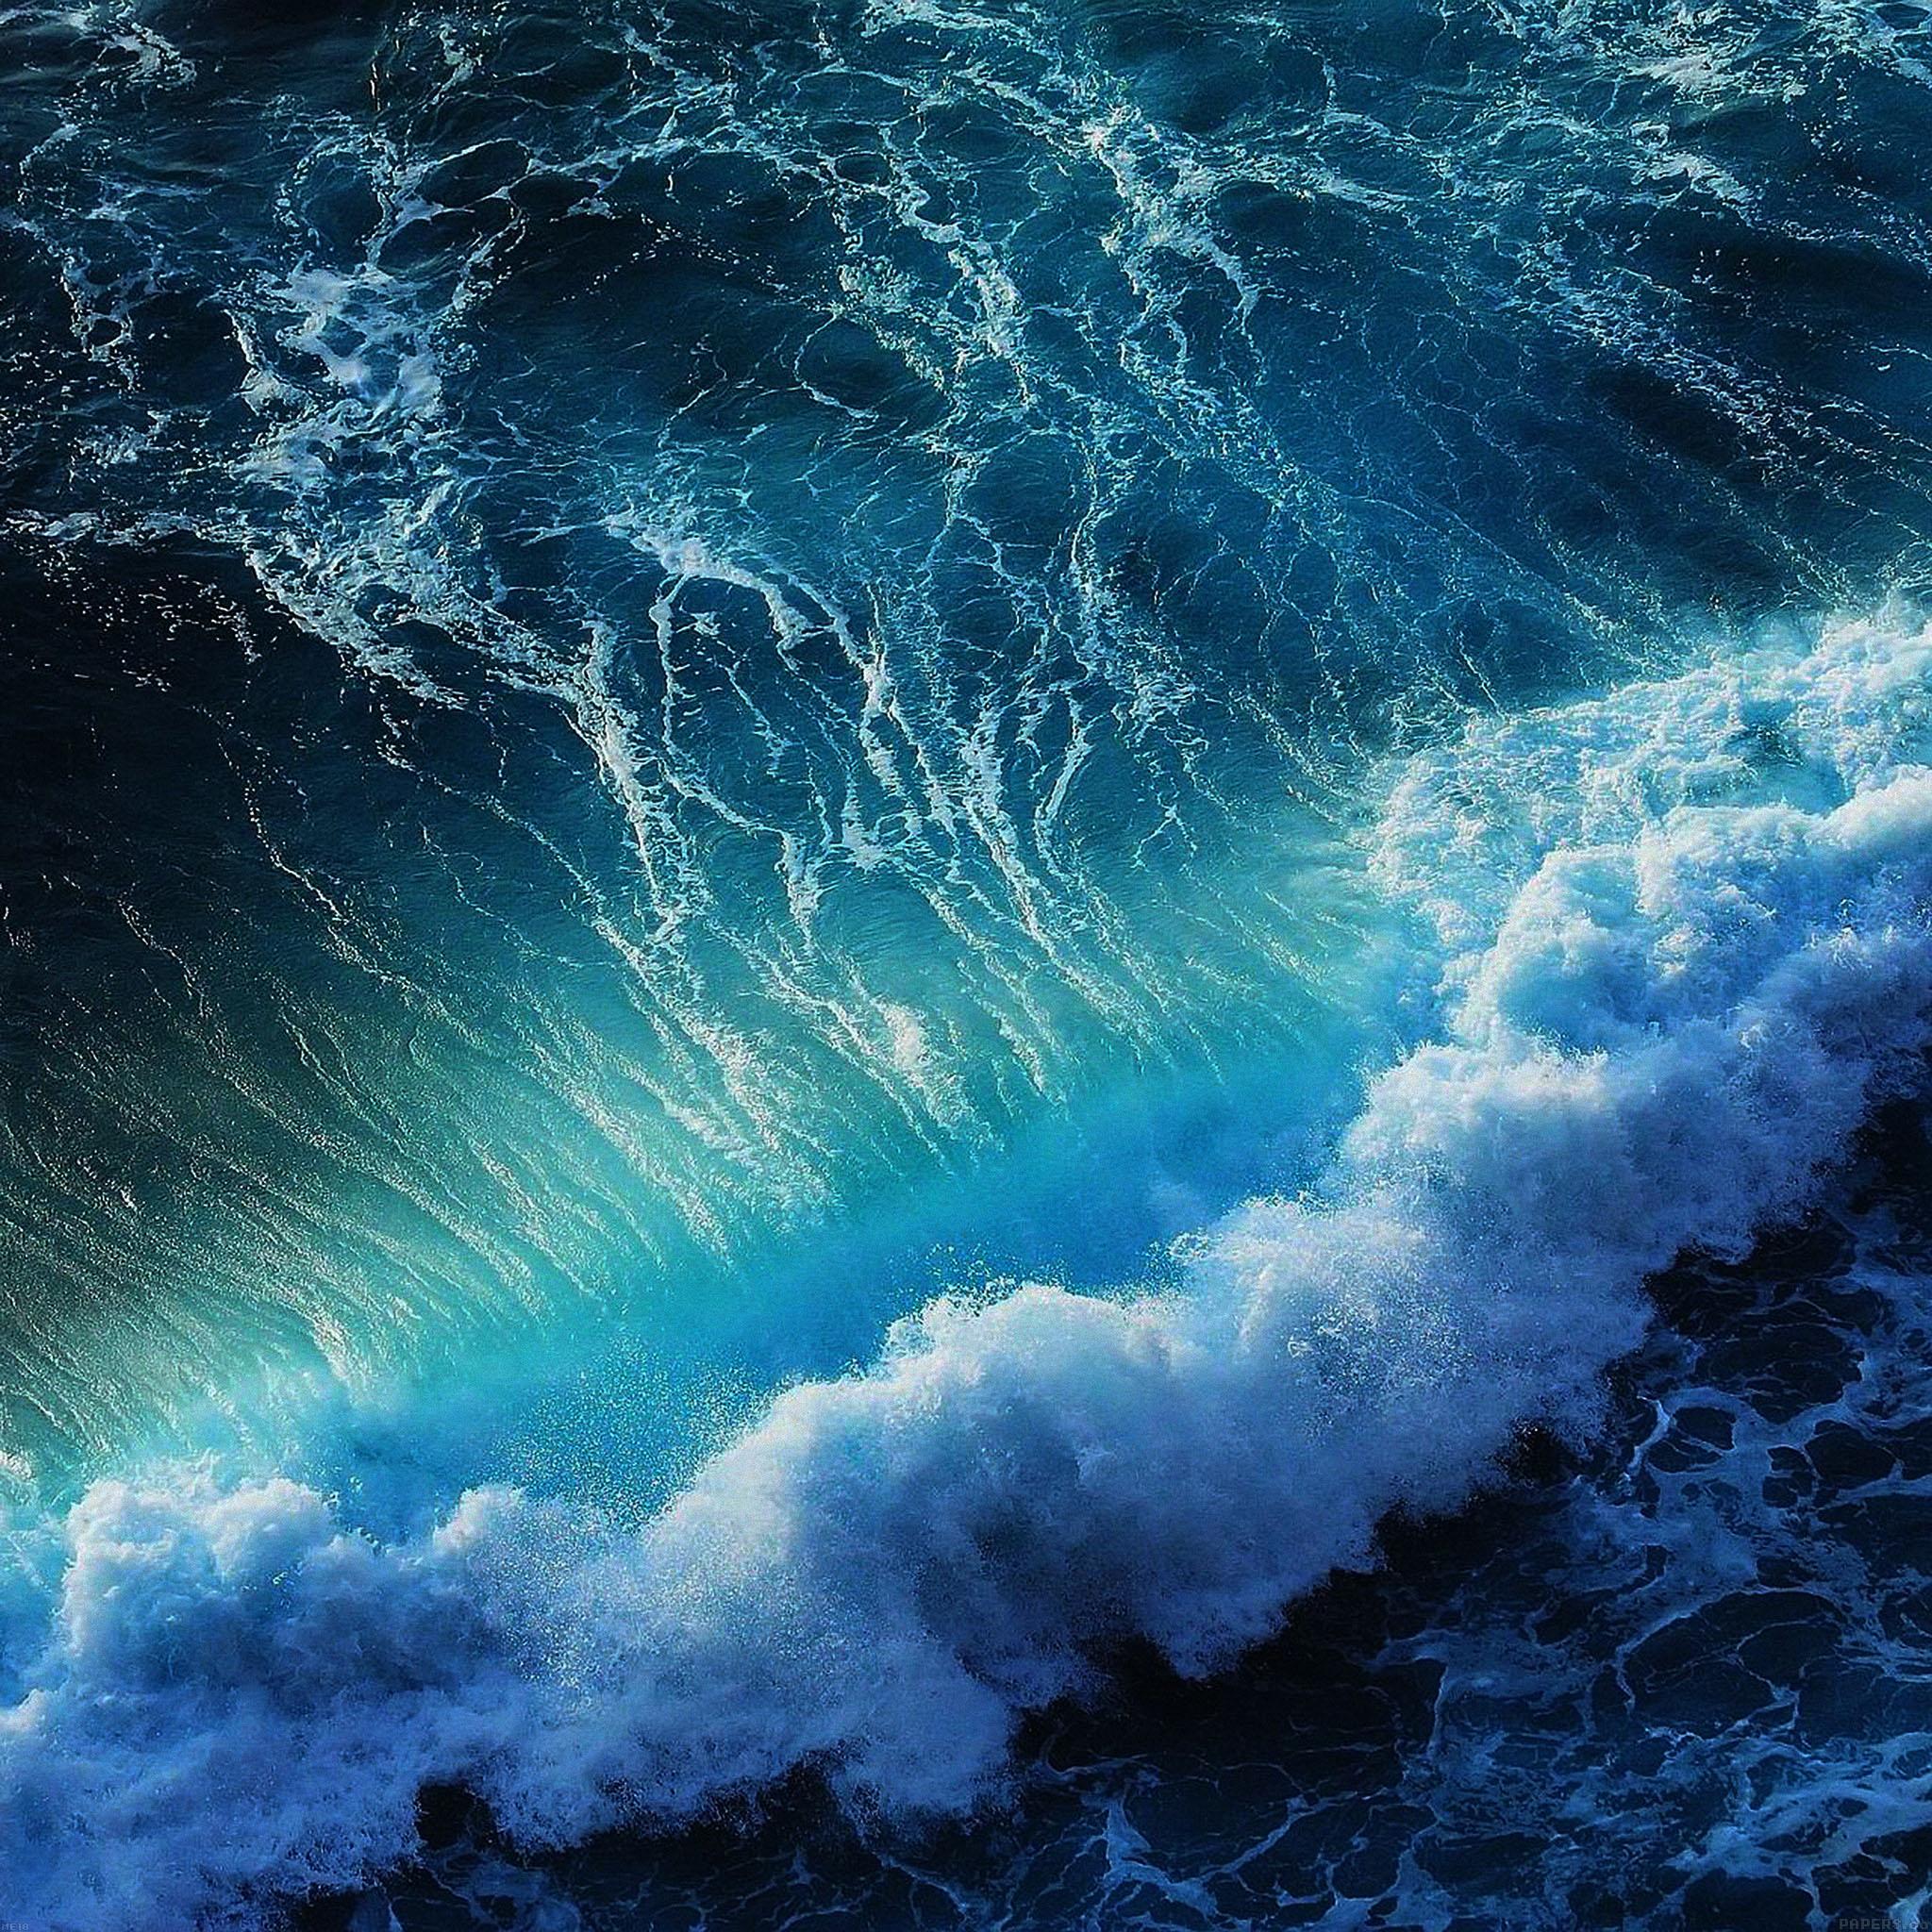 Hd Ocean Wallpaper: Me18-wave-california-ocean - Parallax HD IPhone